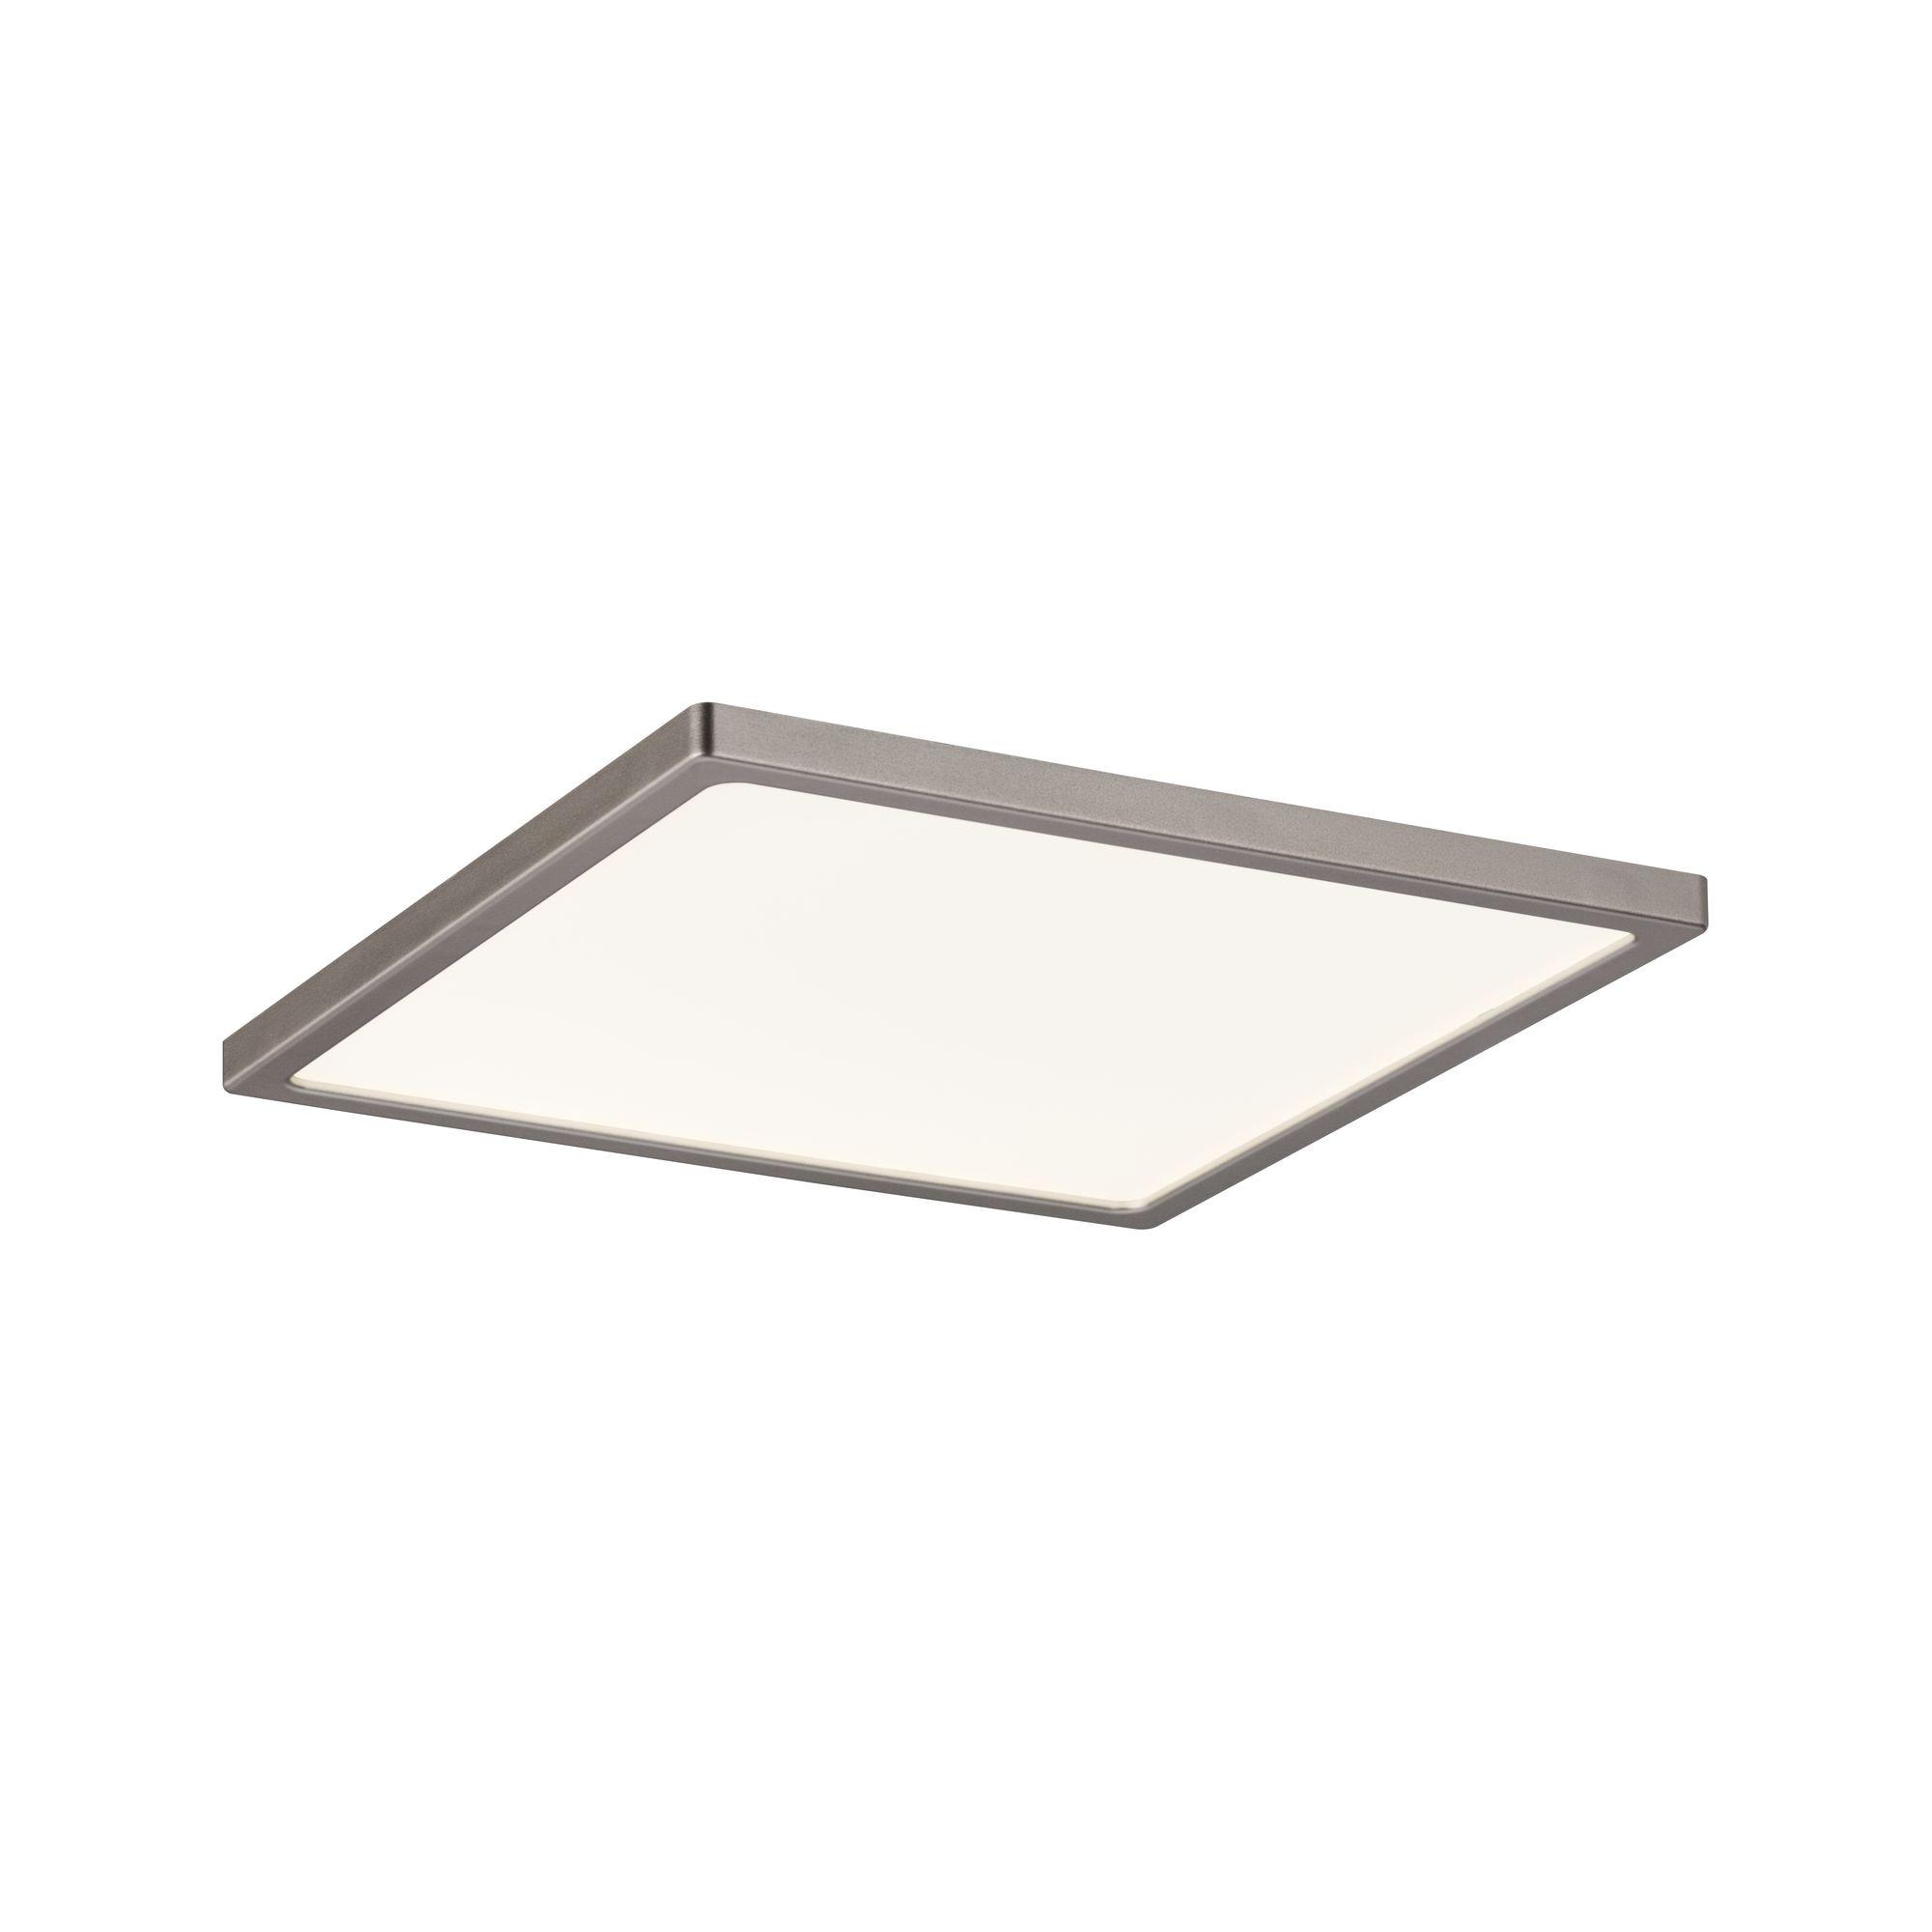 Paulmann LED Einbaustrahler Panel Areo IP44 eckig dimmbar 180x180mm 12W 3.000K Nickel matt, Warmweiß